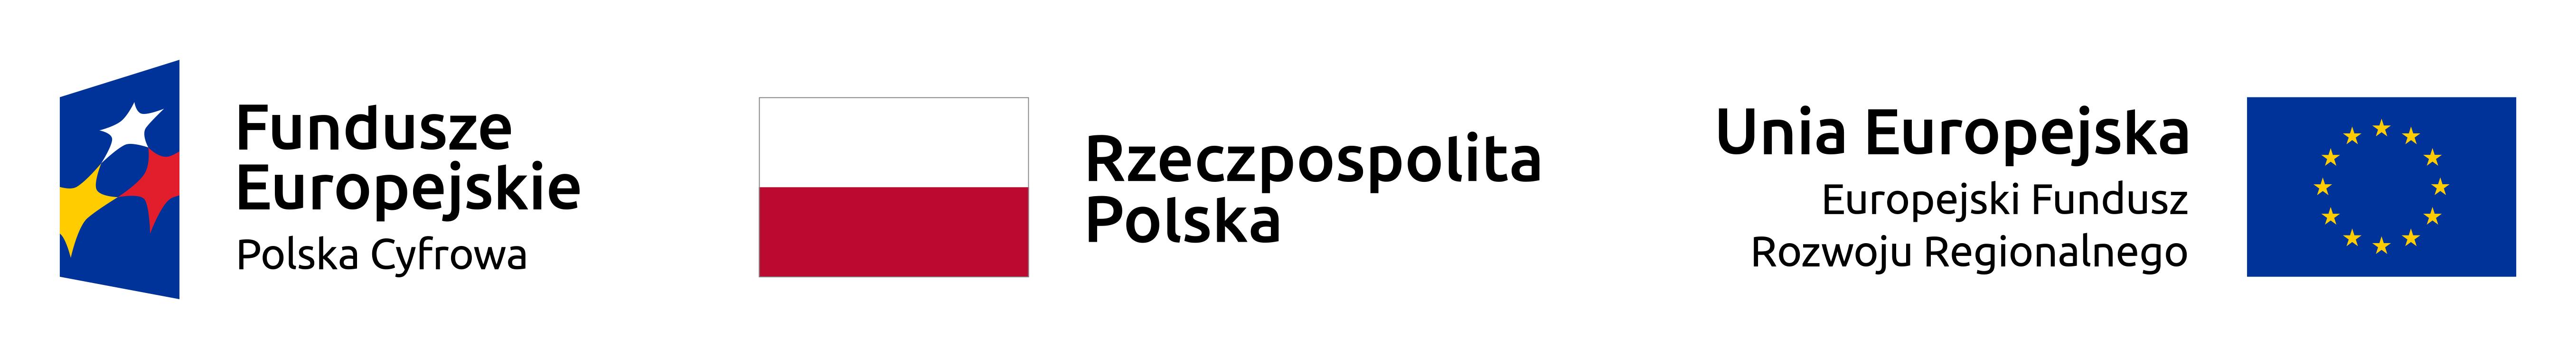 Fundusze Europejskie - Polska Cyfrowa - baner